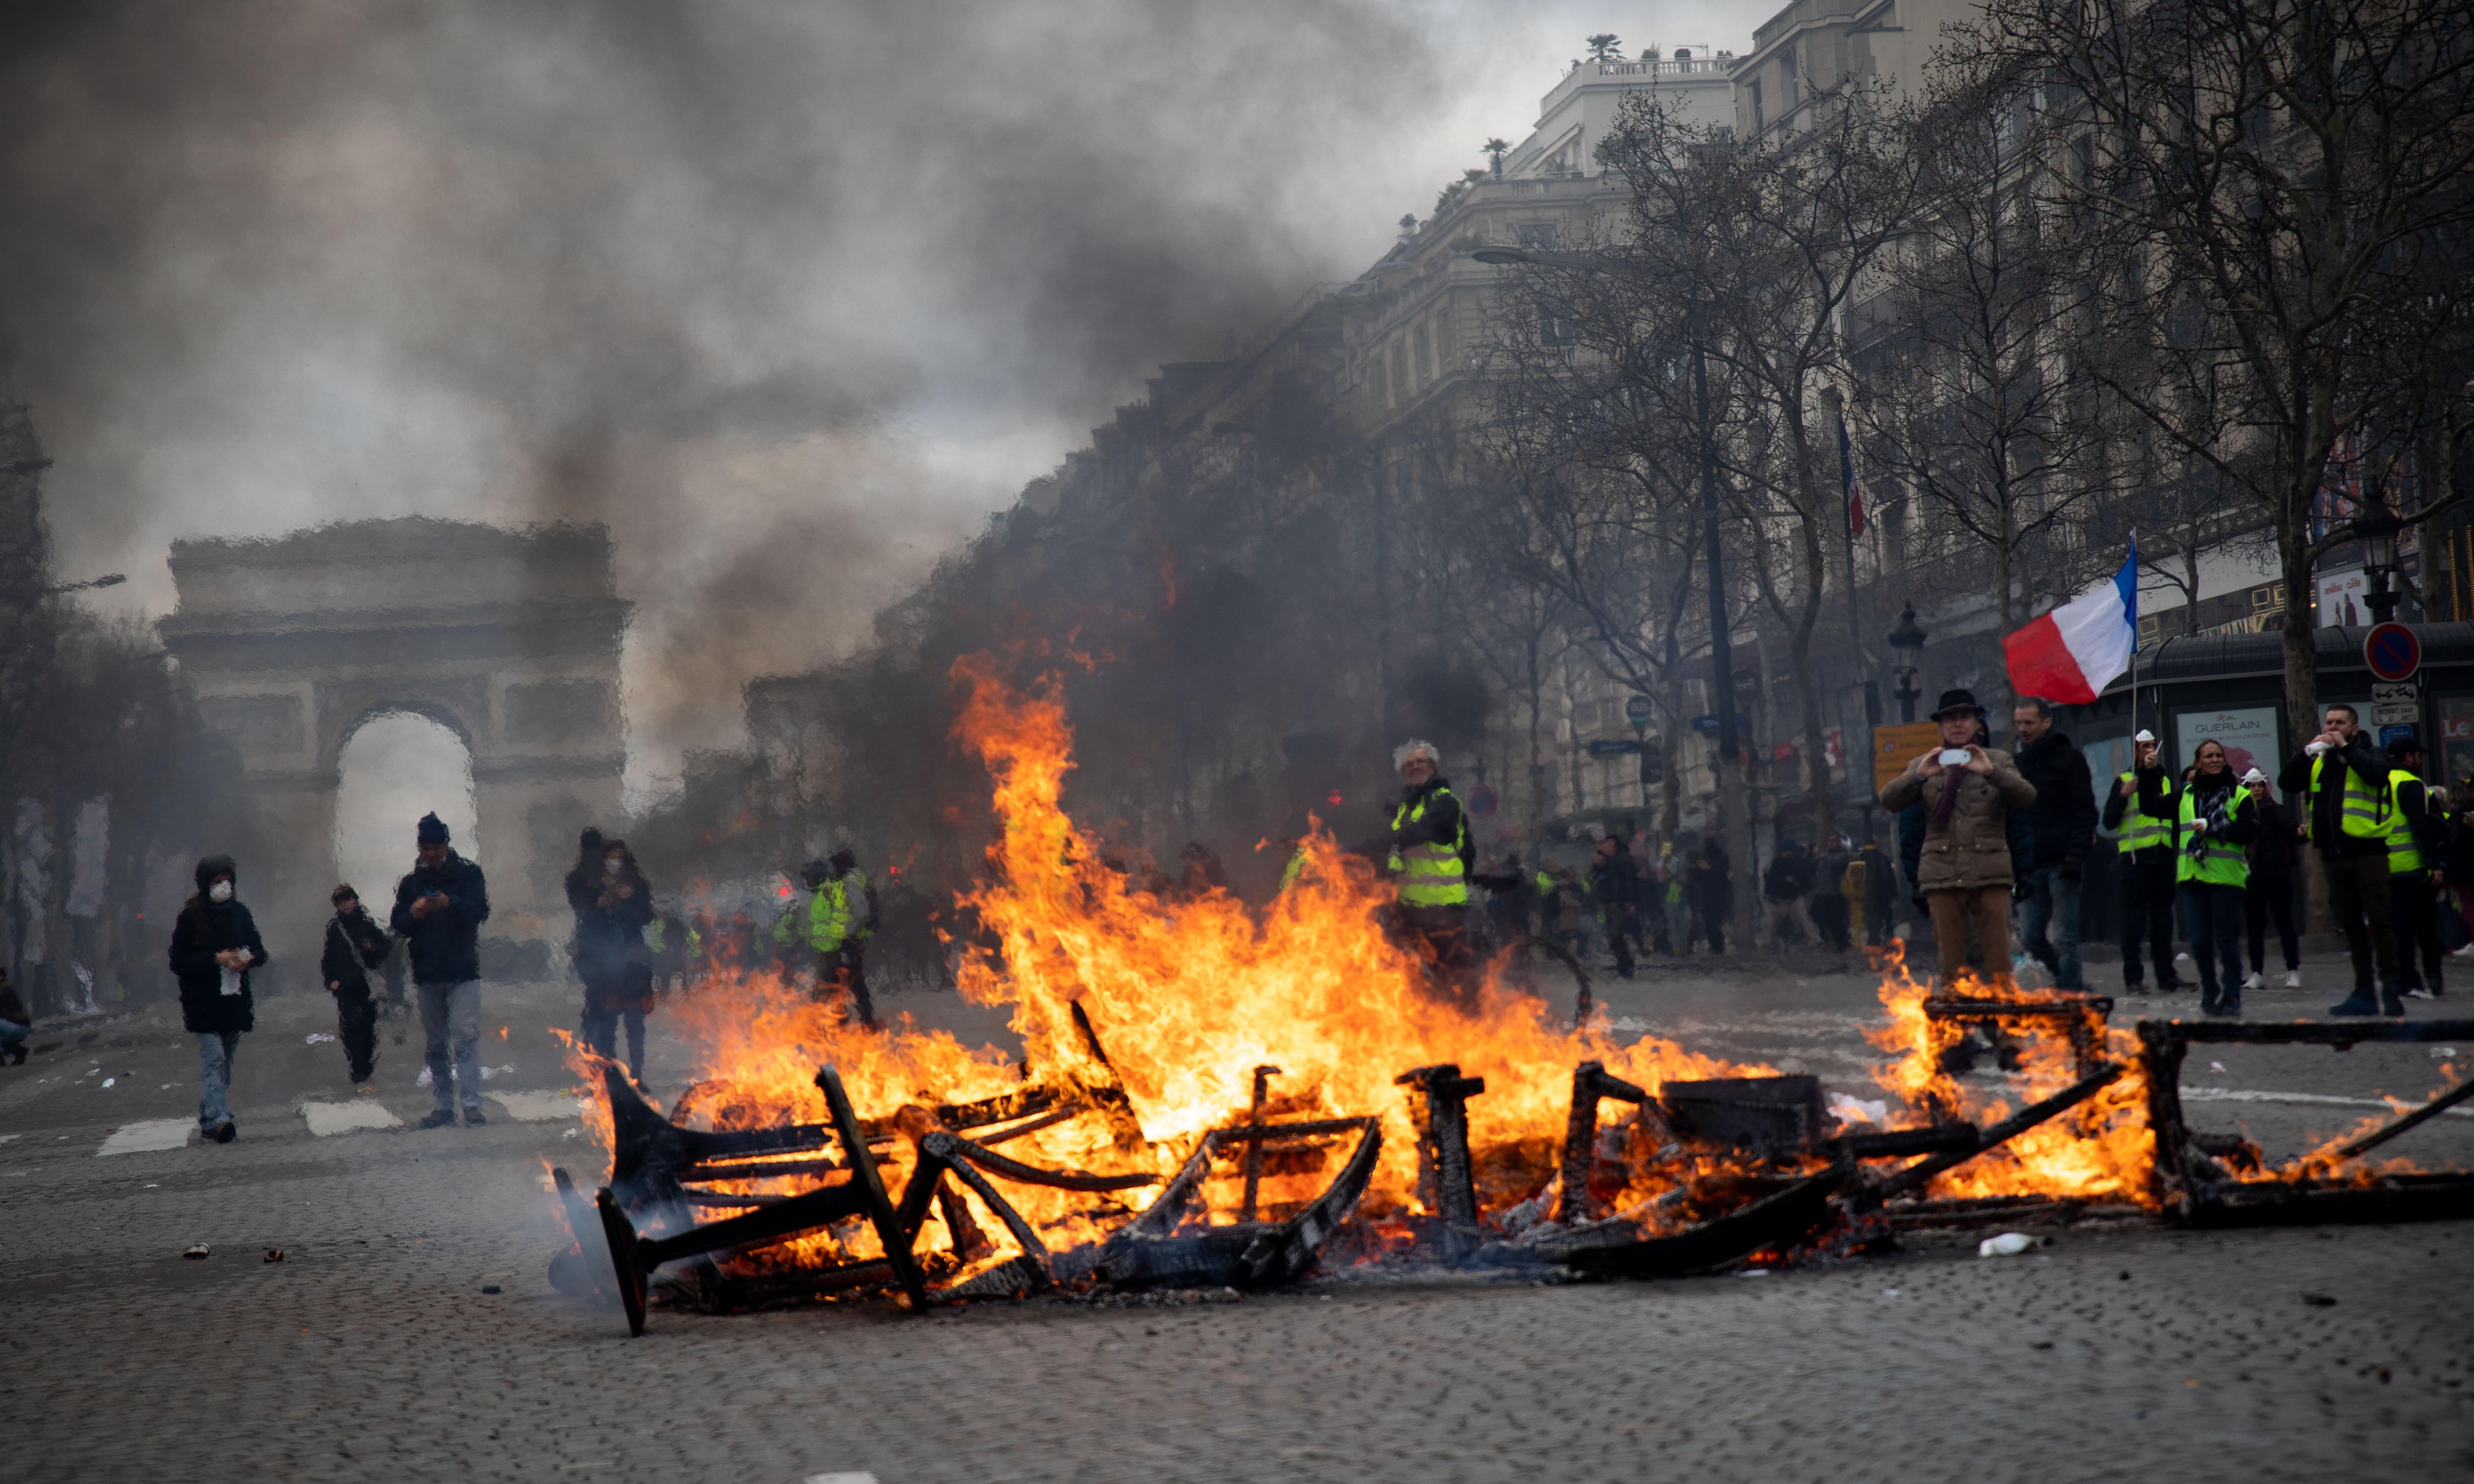 French government unprepared for gilets jaunes riots, critics say